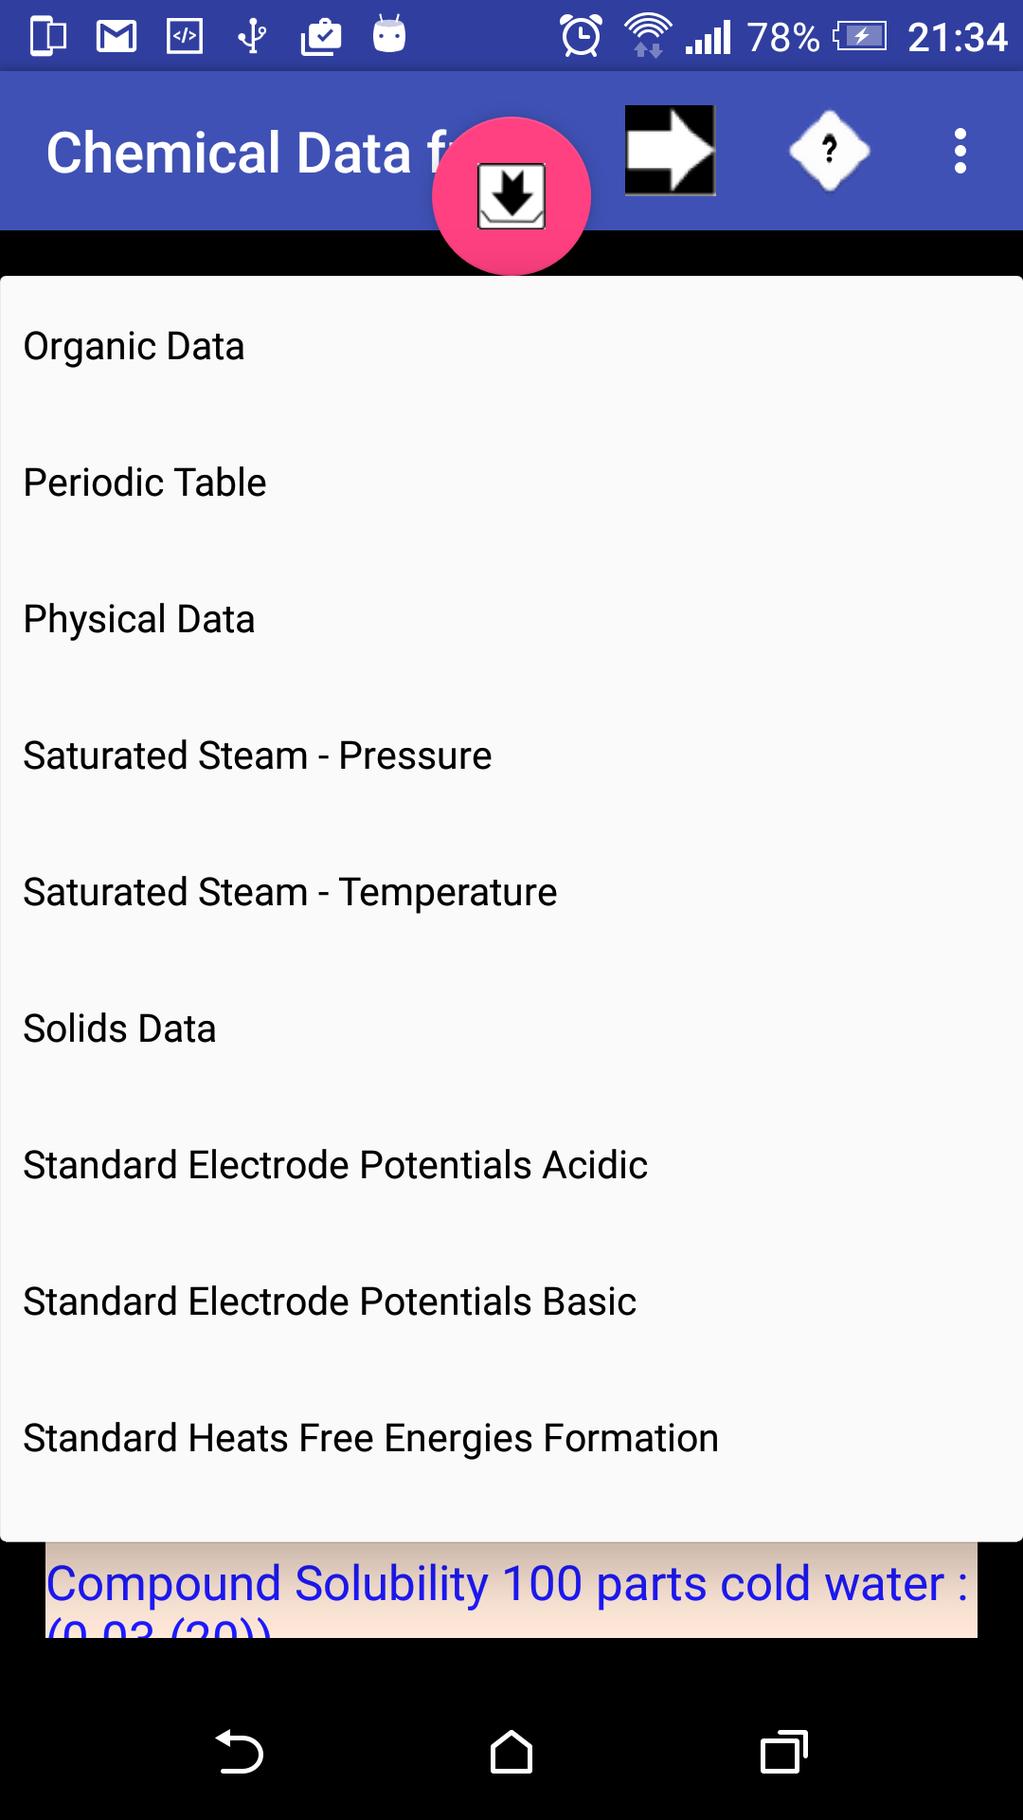 Chemical Data Screenshot 2